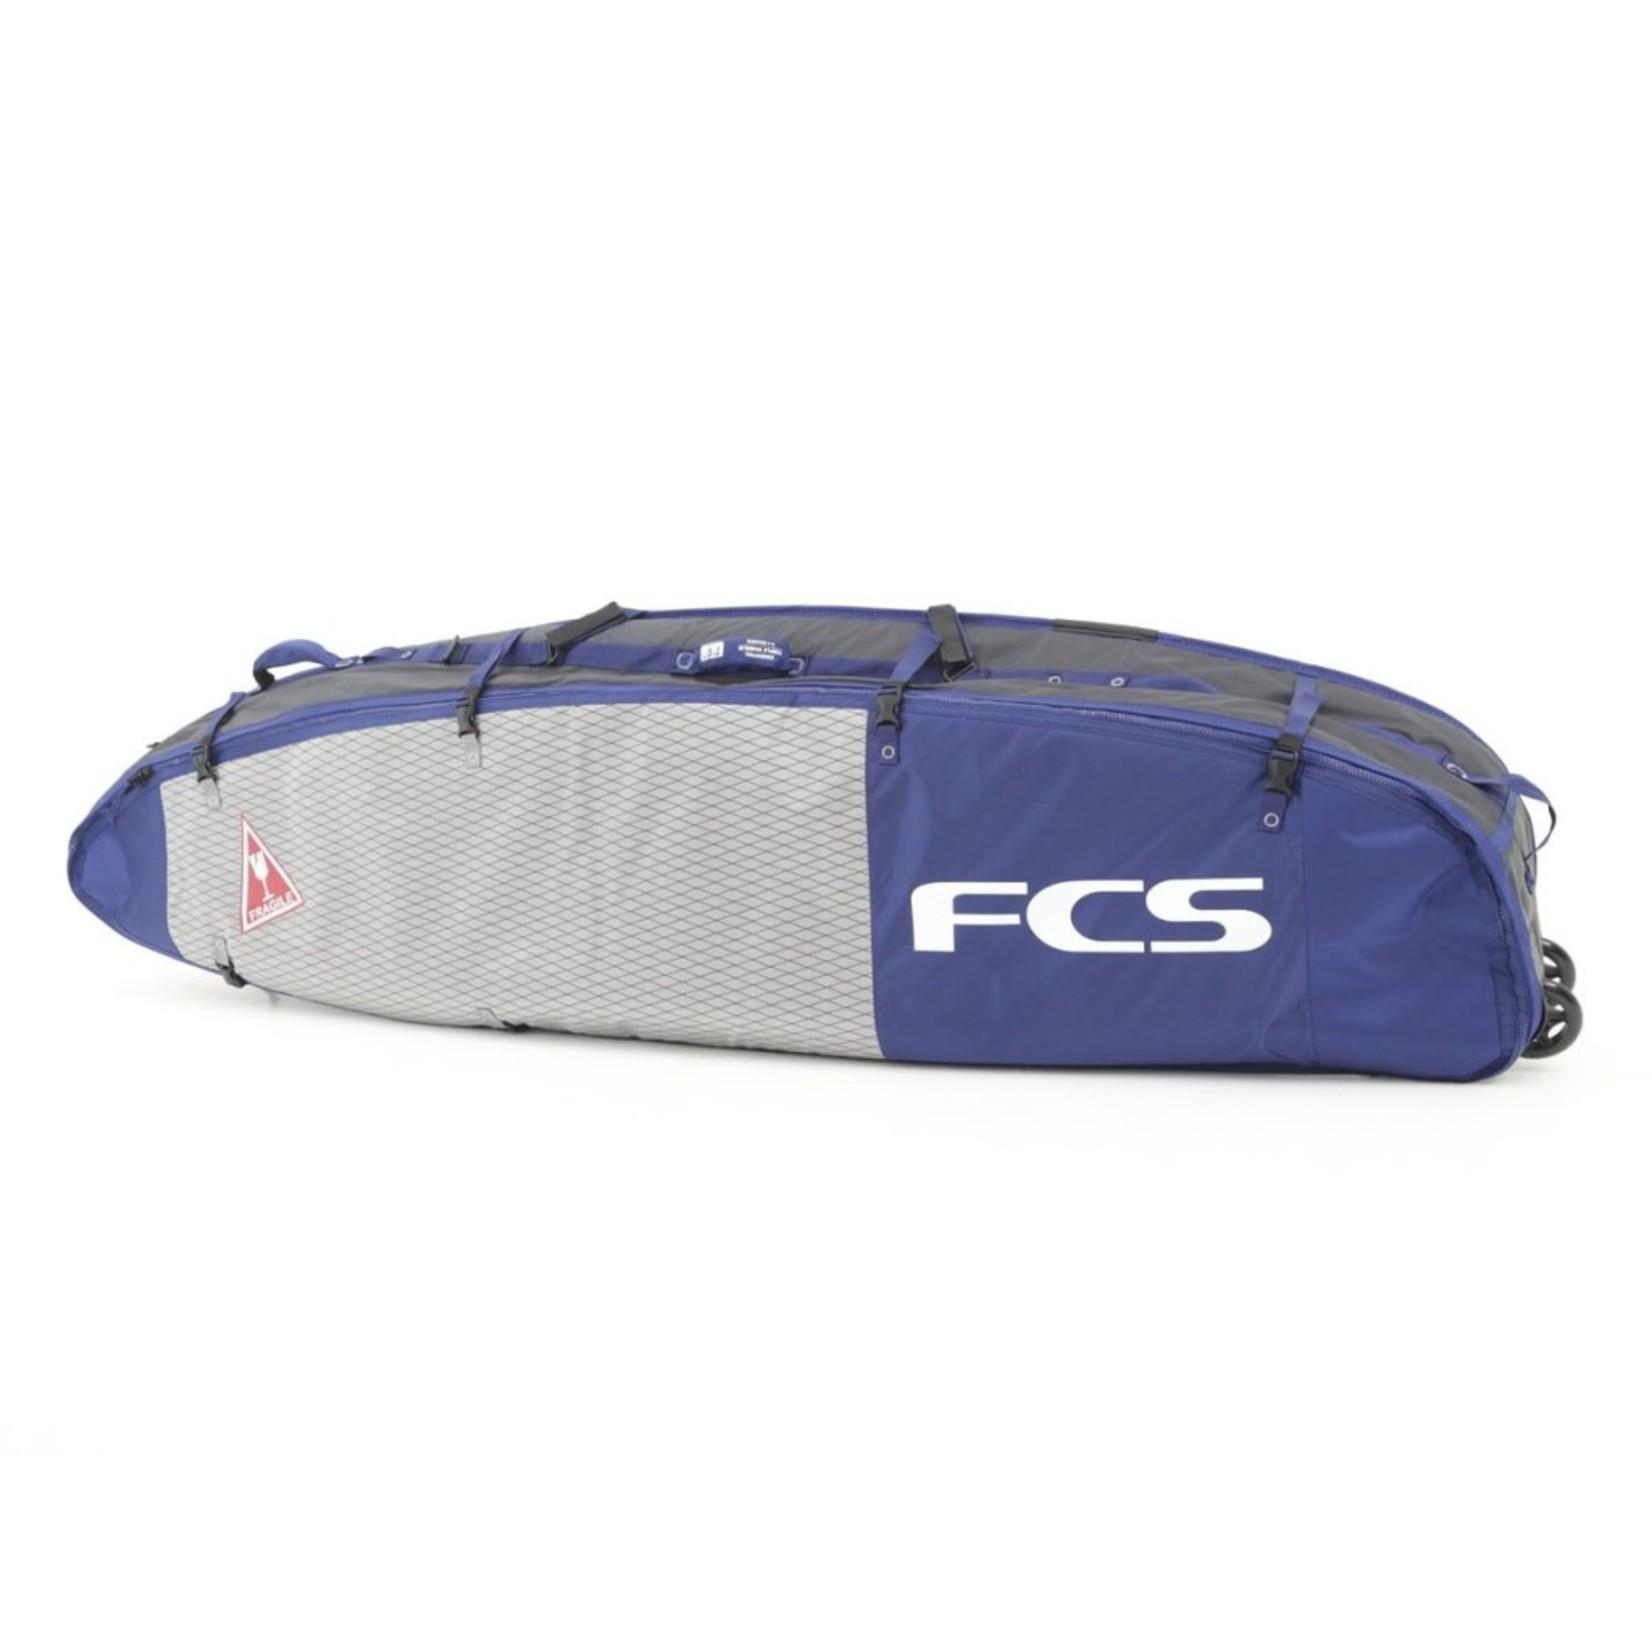 FCS FCS Triple Wheelie All Purpose Travel Cover 7'0